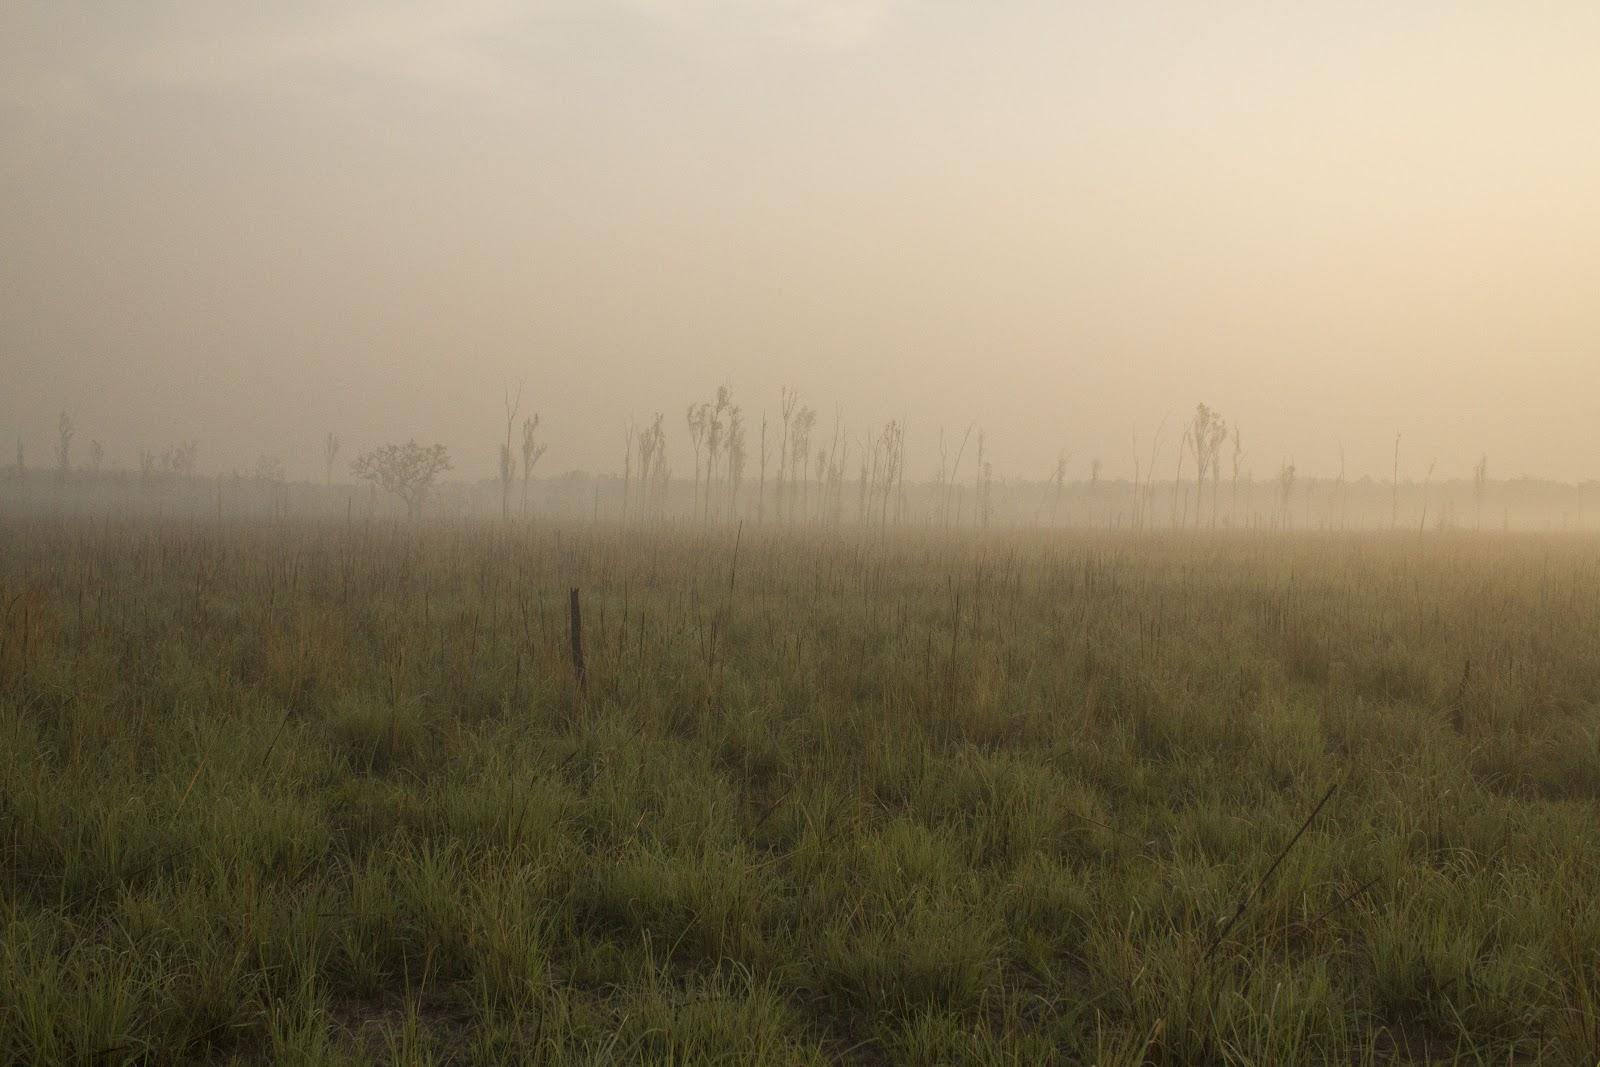 Dudhwa+Landscape+5.JPG